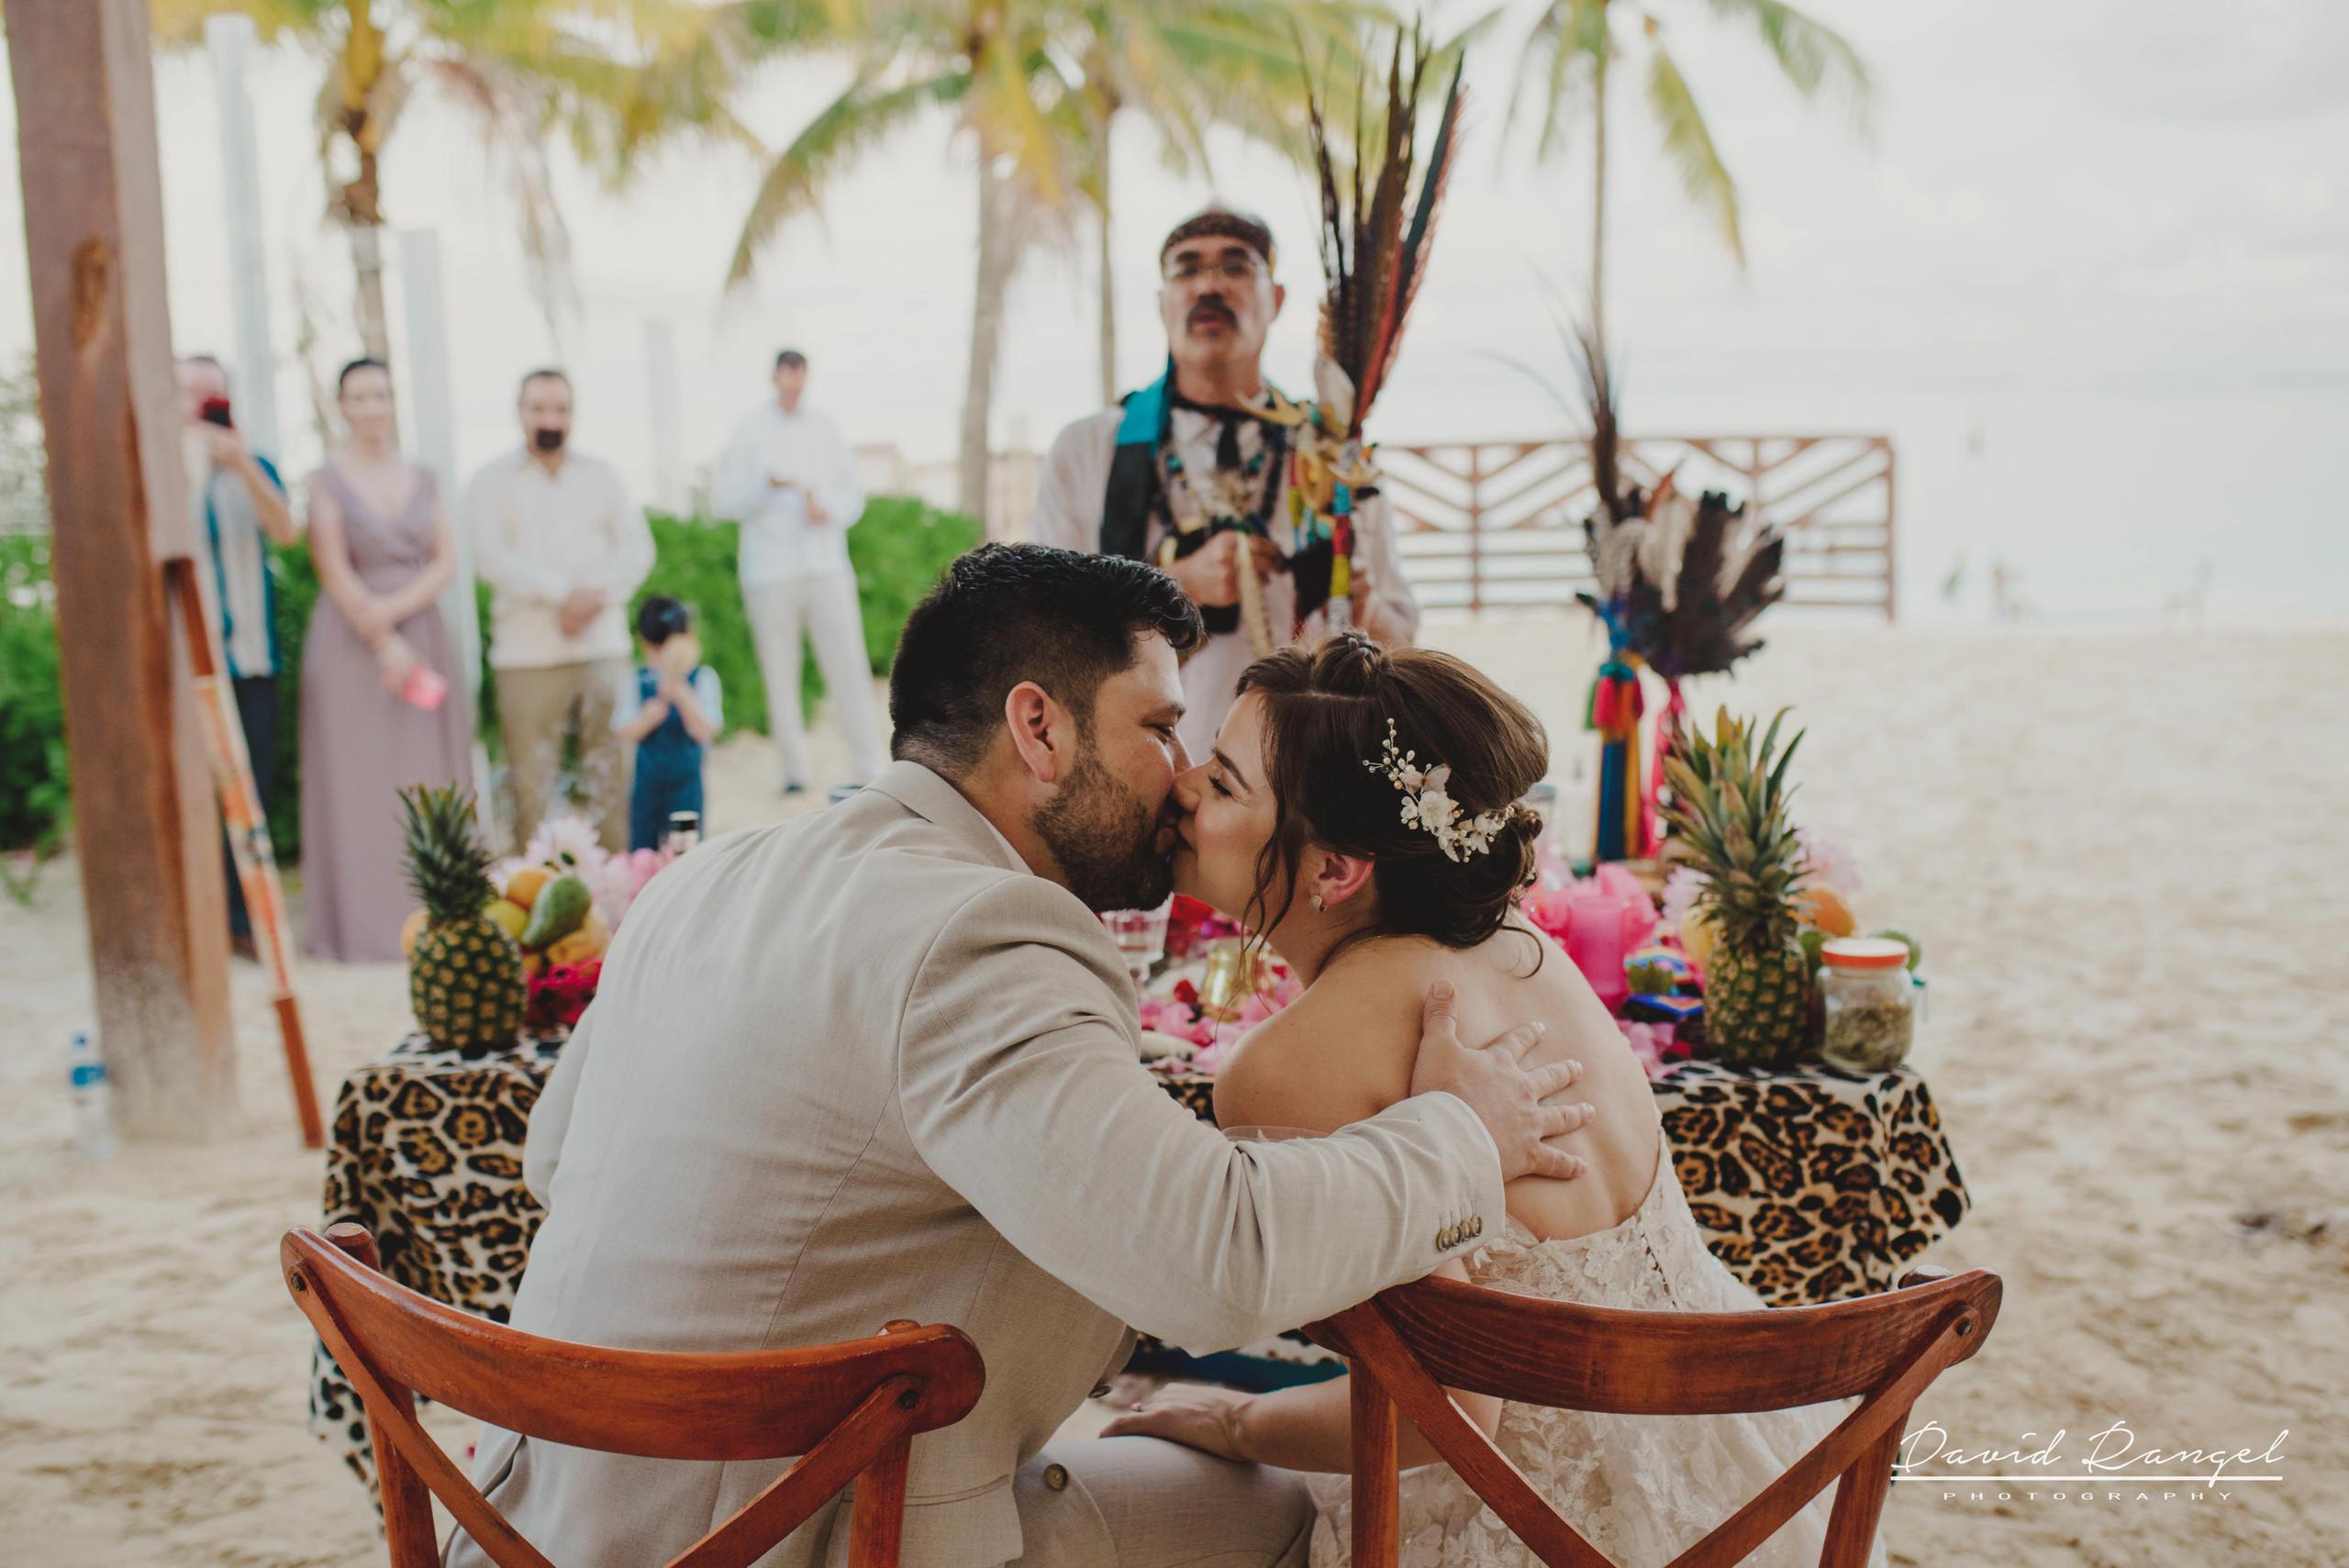 groom+bride+wedding+ceremony+dress+villa+chenera+isla+blanca+costa+mujeres+garden+beach+chaman+traditional+mayan+wedding+gazebo+kiss+she+say+yes